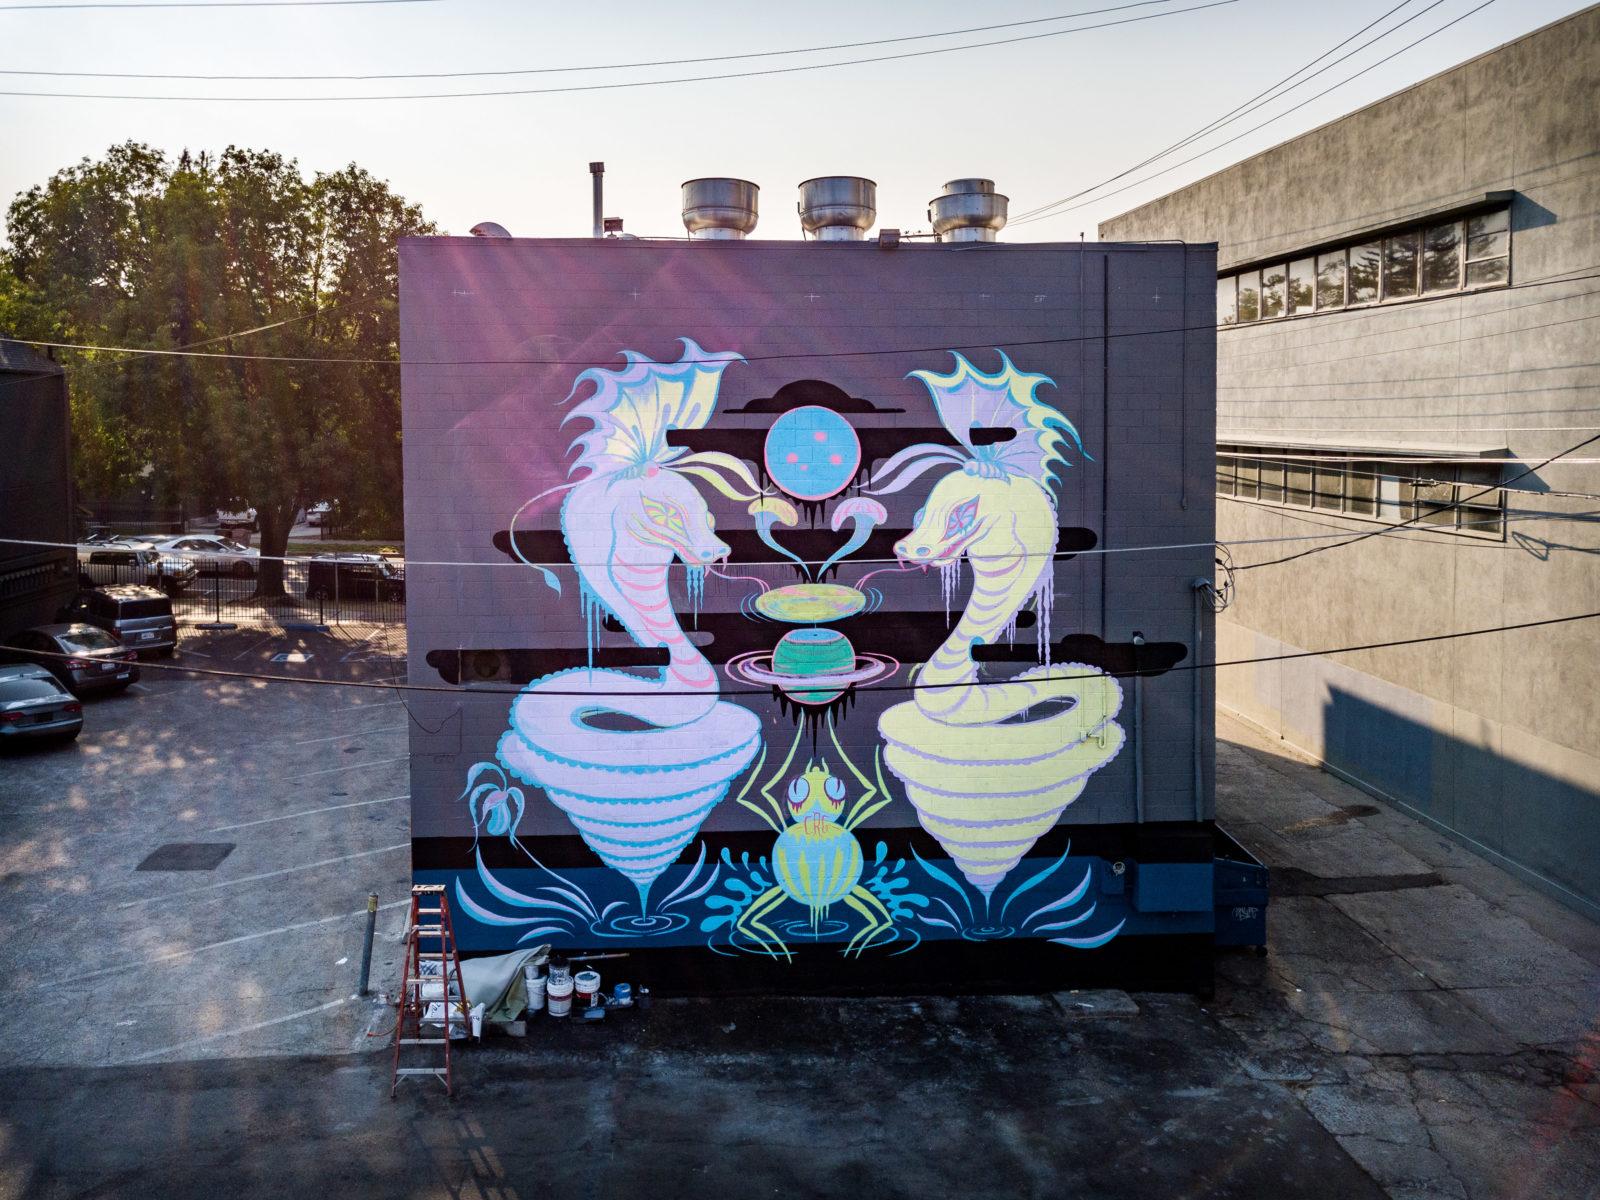 street art wide open walls sacramento californie USA festival mural pastel Camille Rose Garcia  MERO radar - Les 10 murales les plus marquantes du festival Wide Open Walls Sacramento